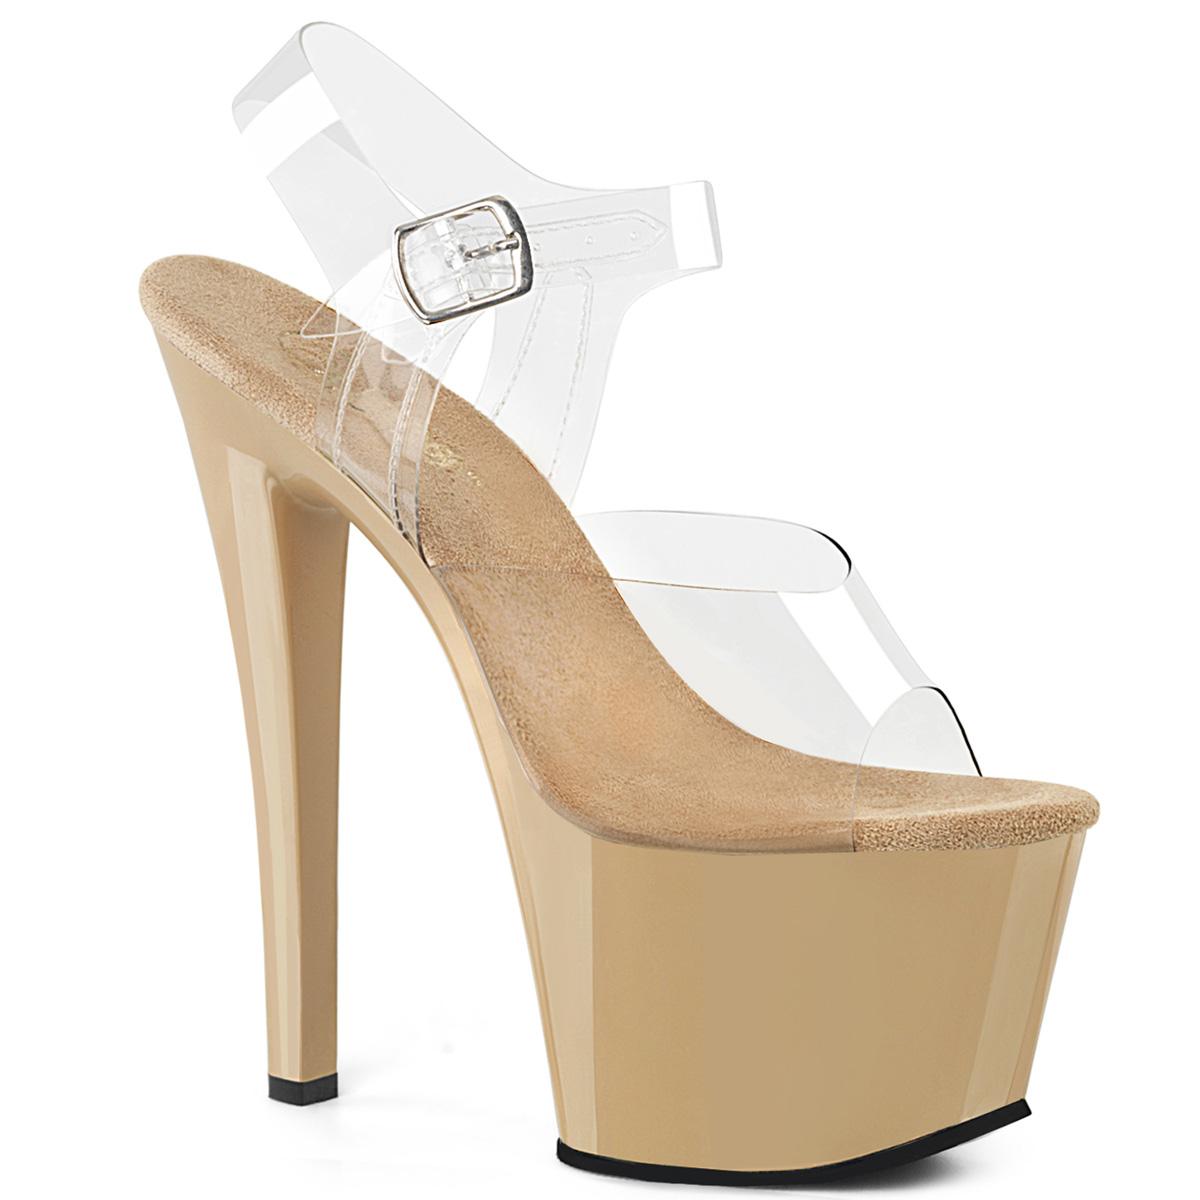 PLEASER Sky-308 Series 7  Heel Heel Heel Sexy Exotic Ankle-Strap Sandal f7478e